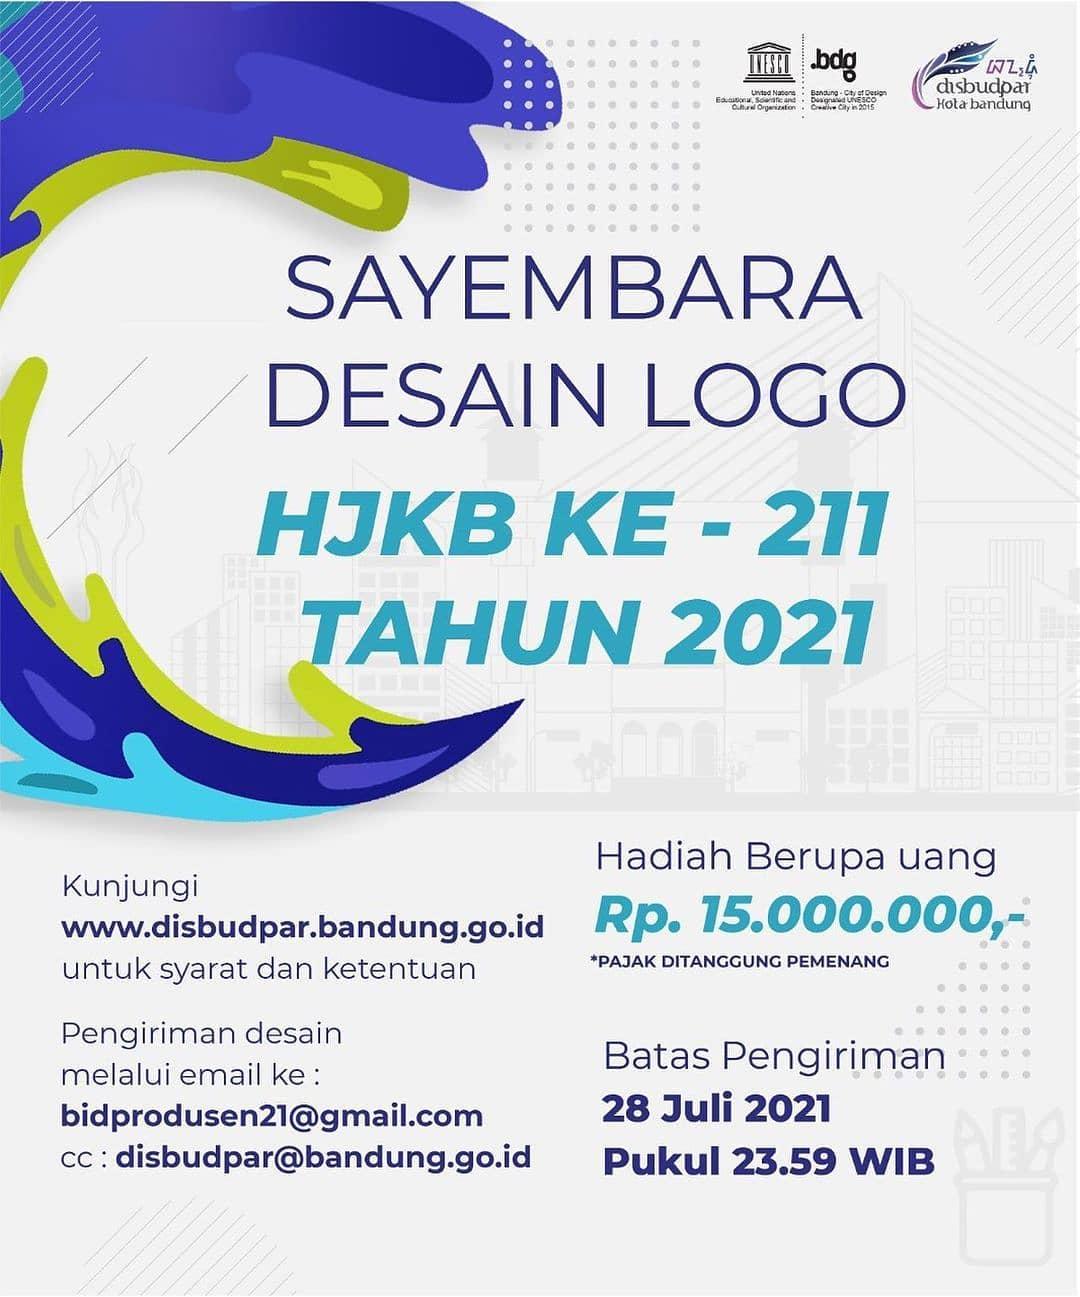 Lomba Desain Logo Hari Jadi Kota Bandung Berhadiah 15 Juta Rupiah